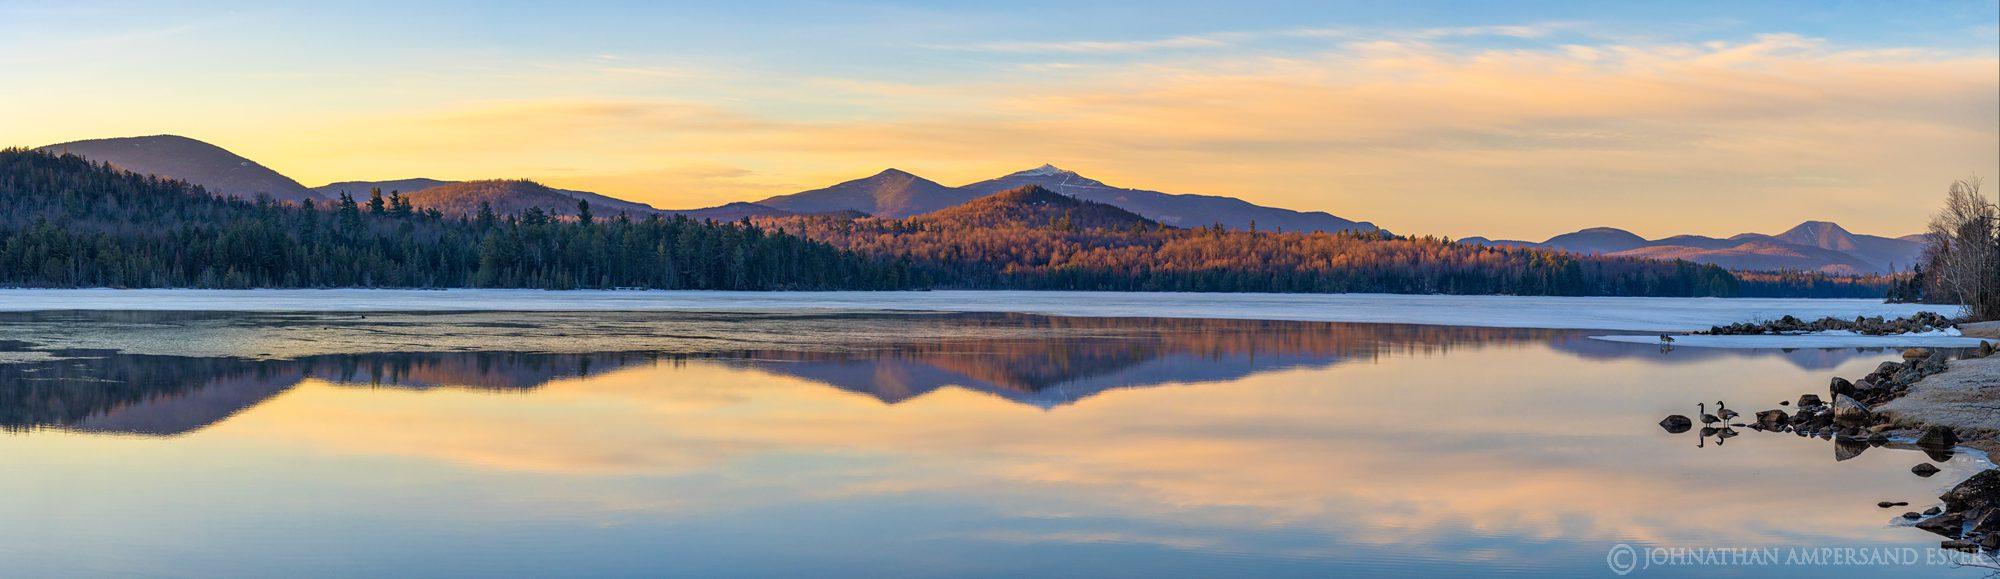 Union Falls Pond,Union Falls,winter,late winter,ice,Canada geese,geese,Whiteface Mt,Moose Mt,panorama,2020,March,lake,Adirondack,Adirondacks,, photo